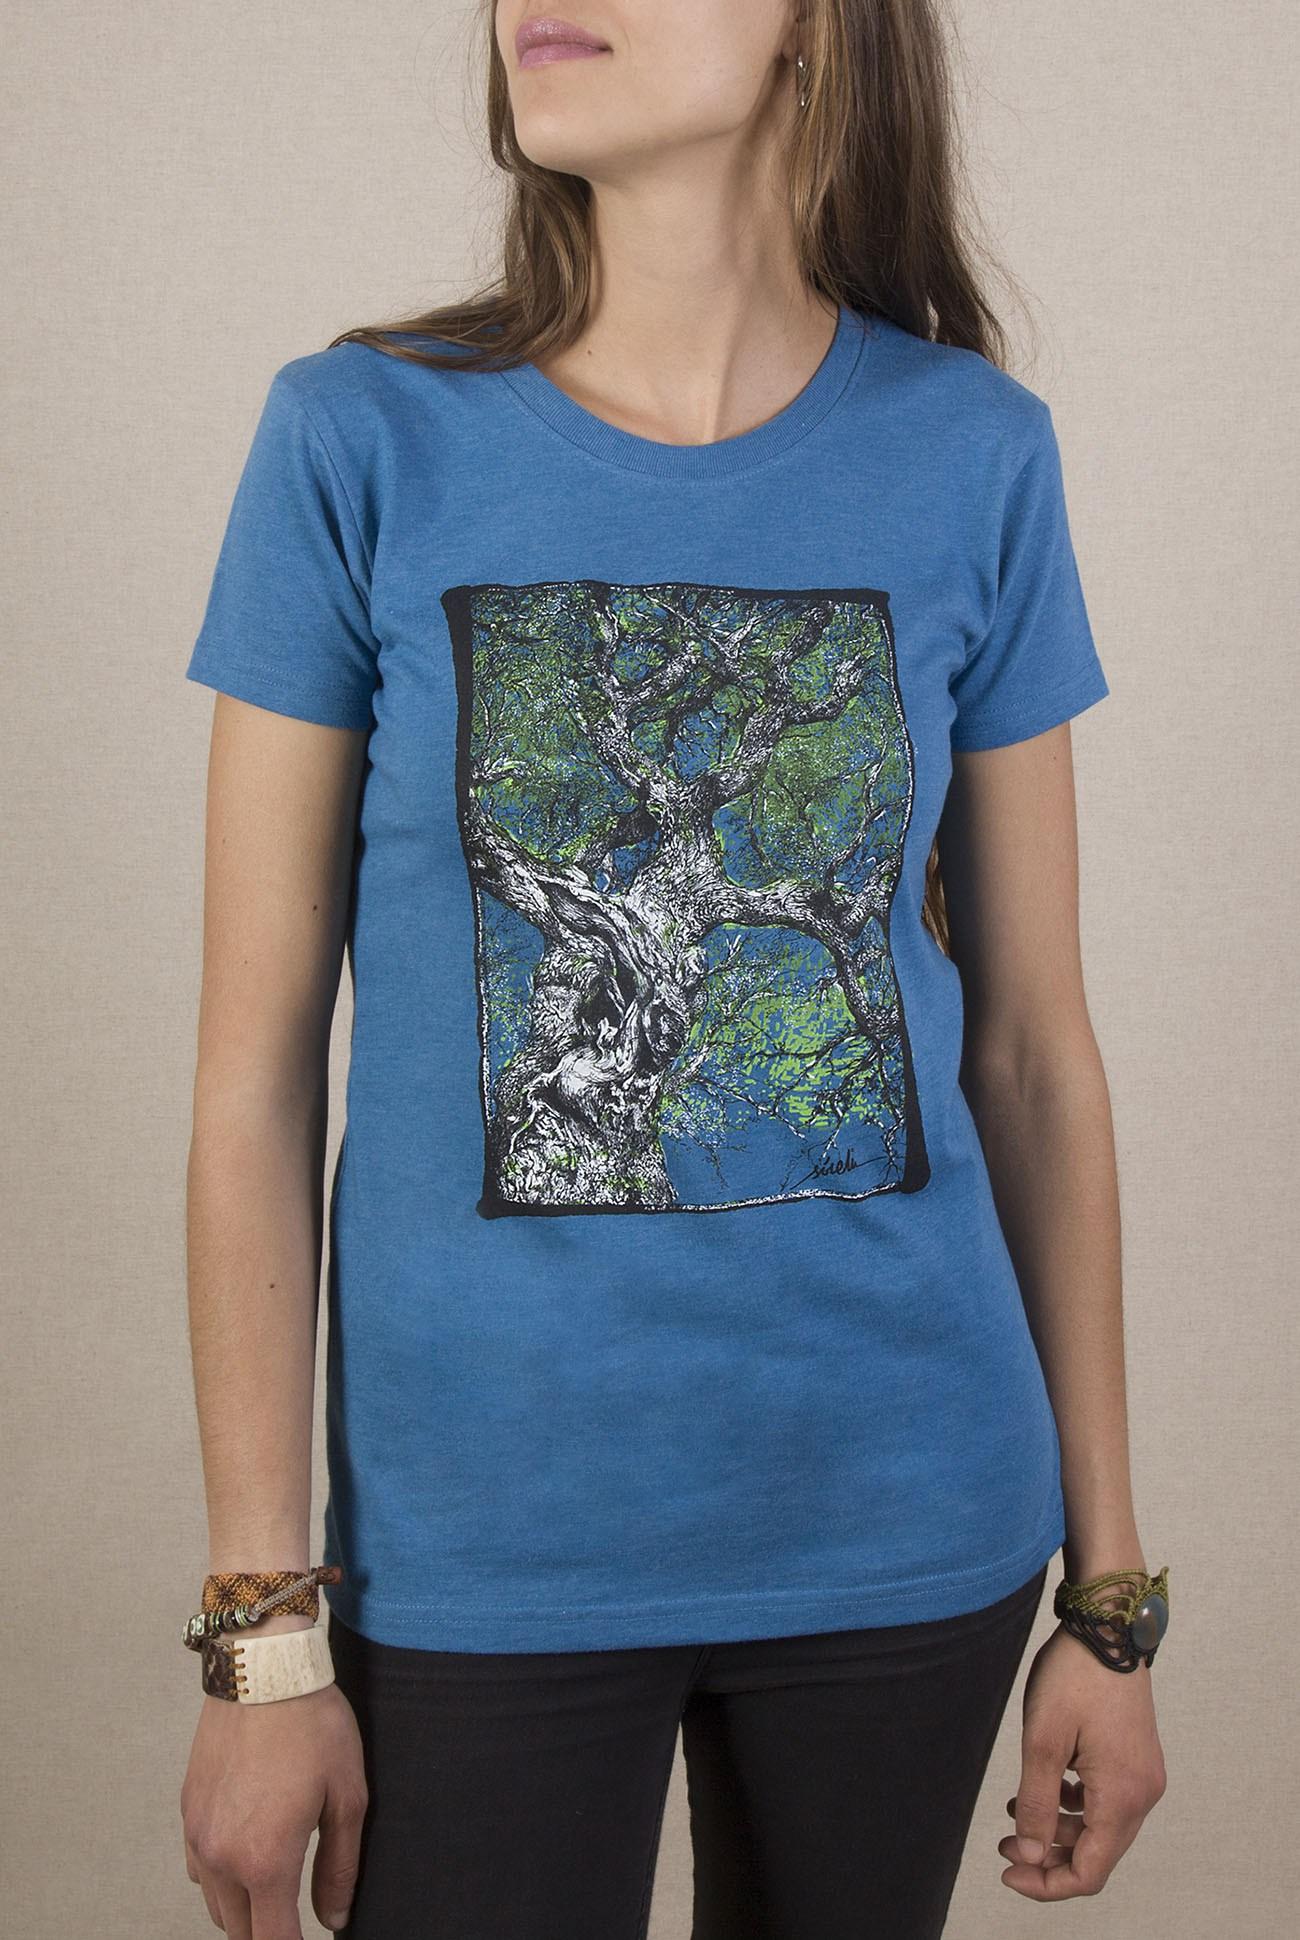 Sirem Wild by Miriam Barahona - Creative Work - $i